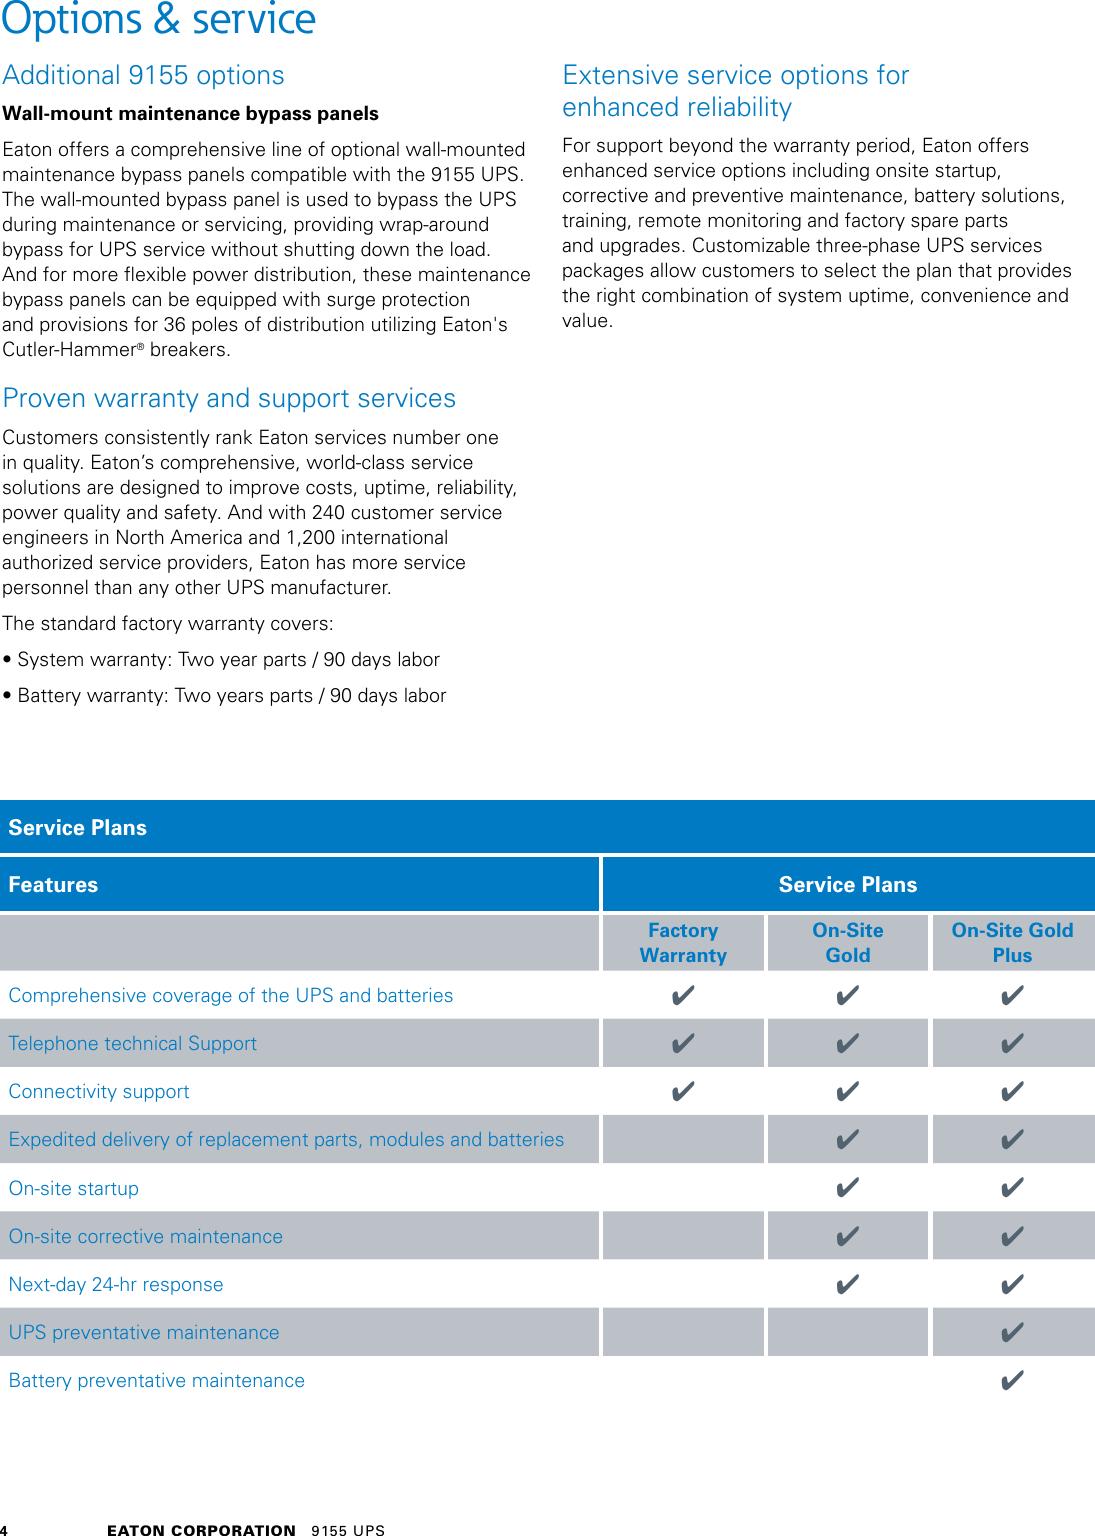 Eaton 9155 Users Manual